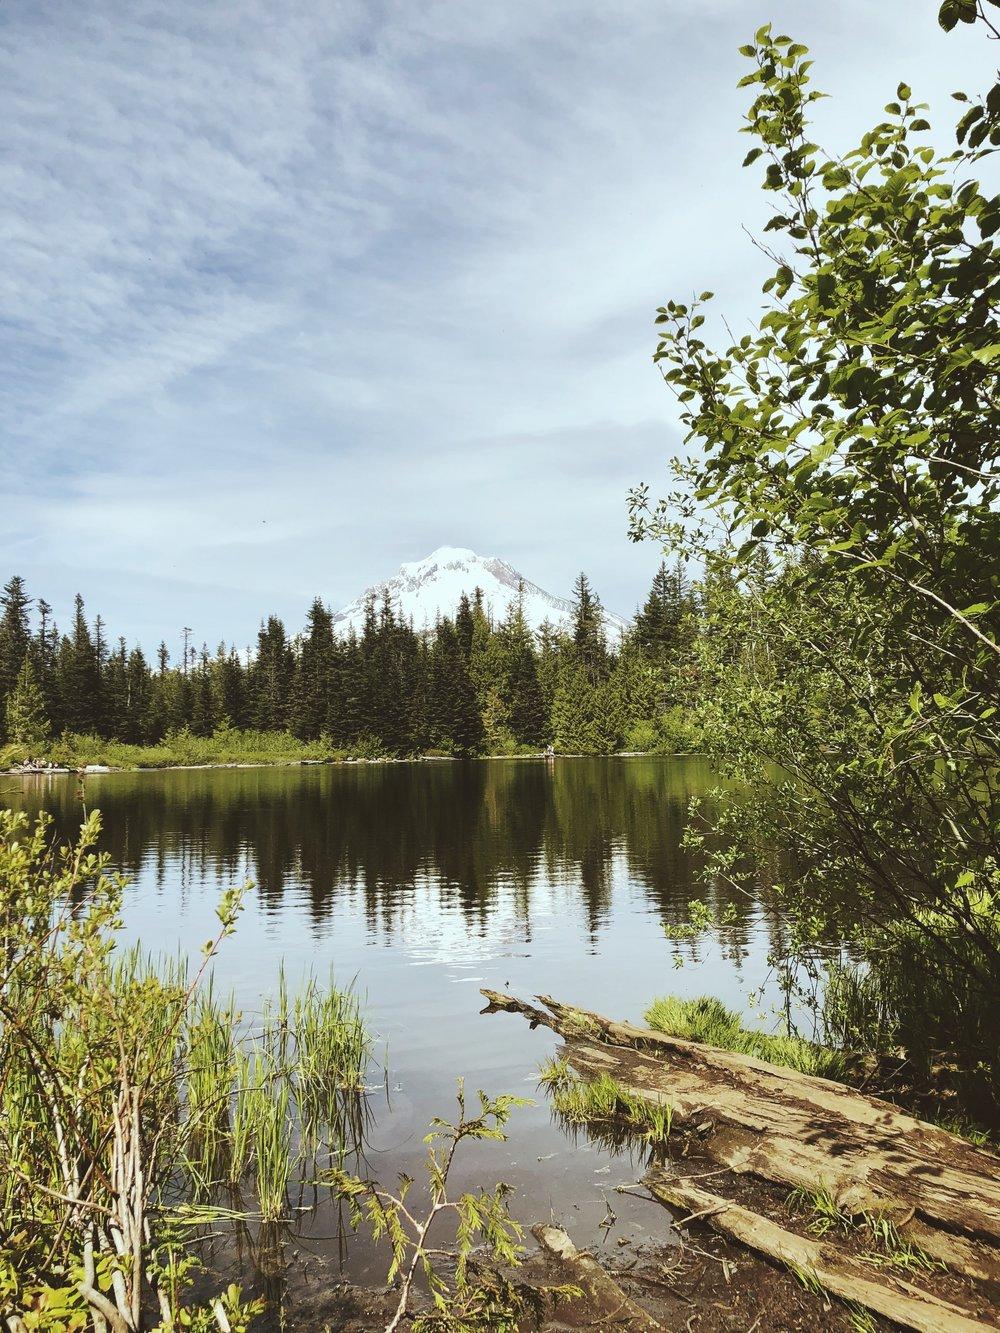 Mirror Lake! Pretty obvious why it got its name.